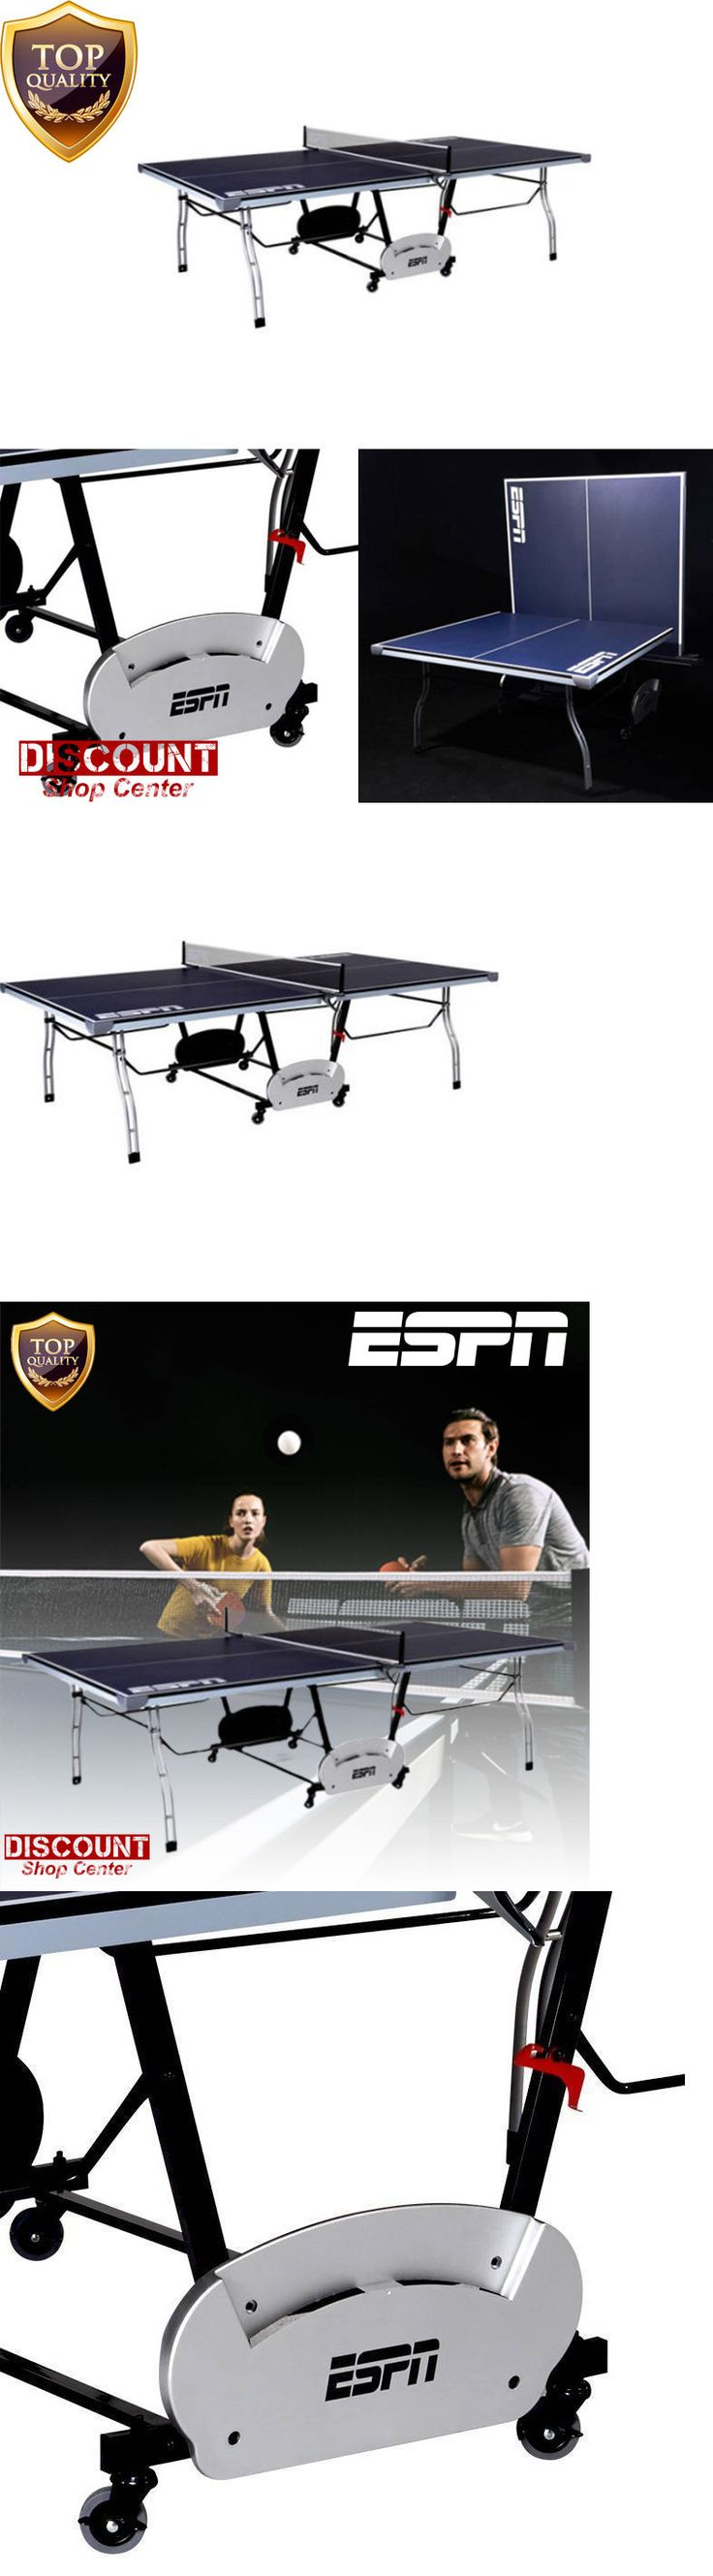 Best 25 Table Tennis Tournament Ideas Only On Pinterest